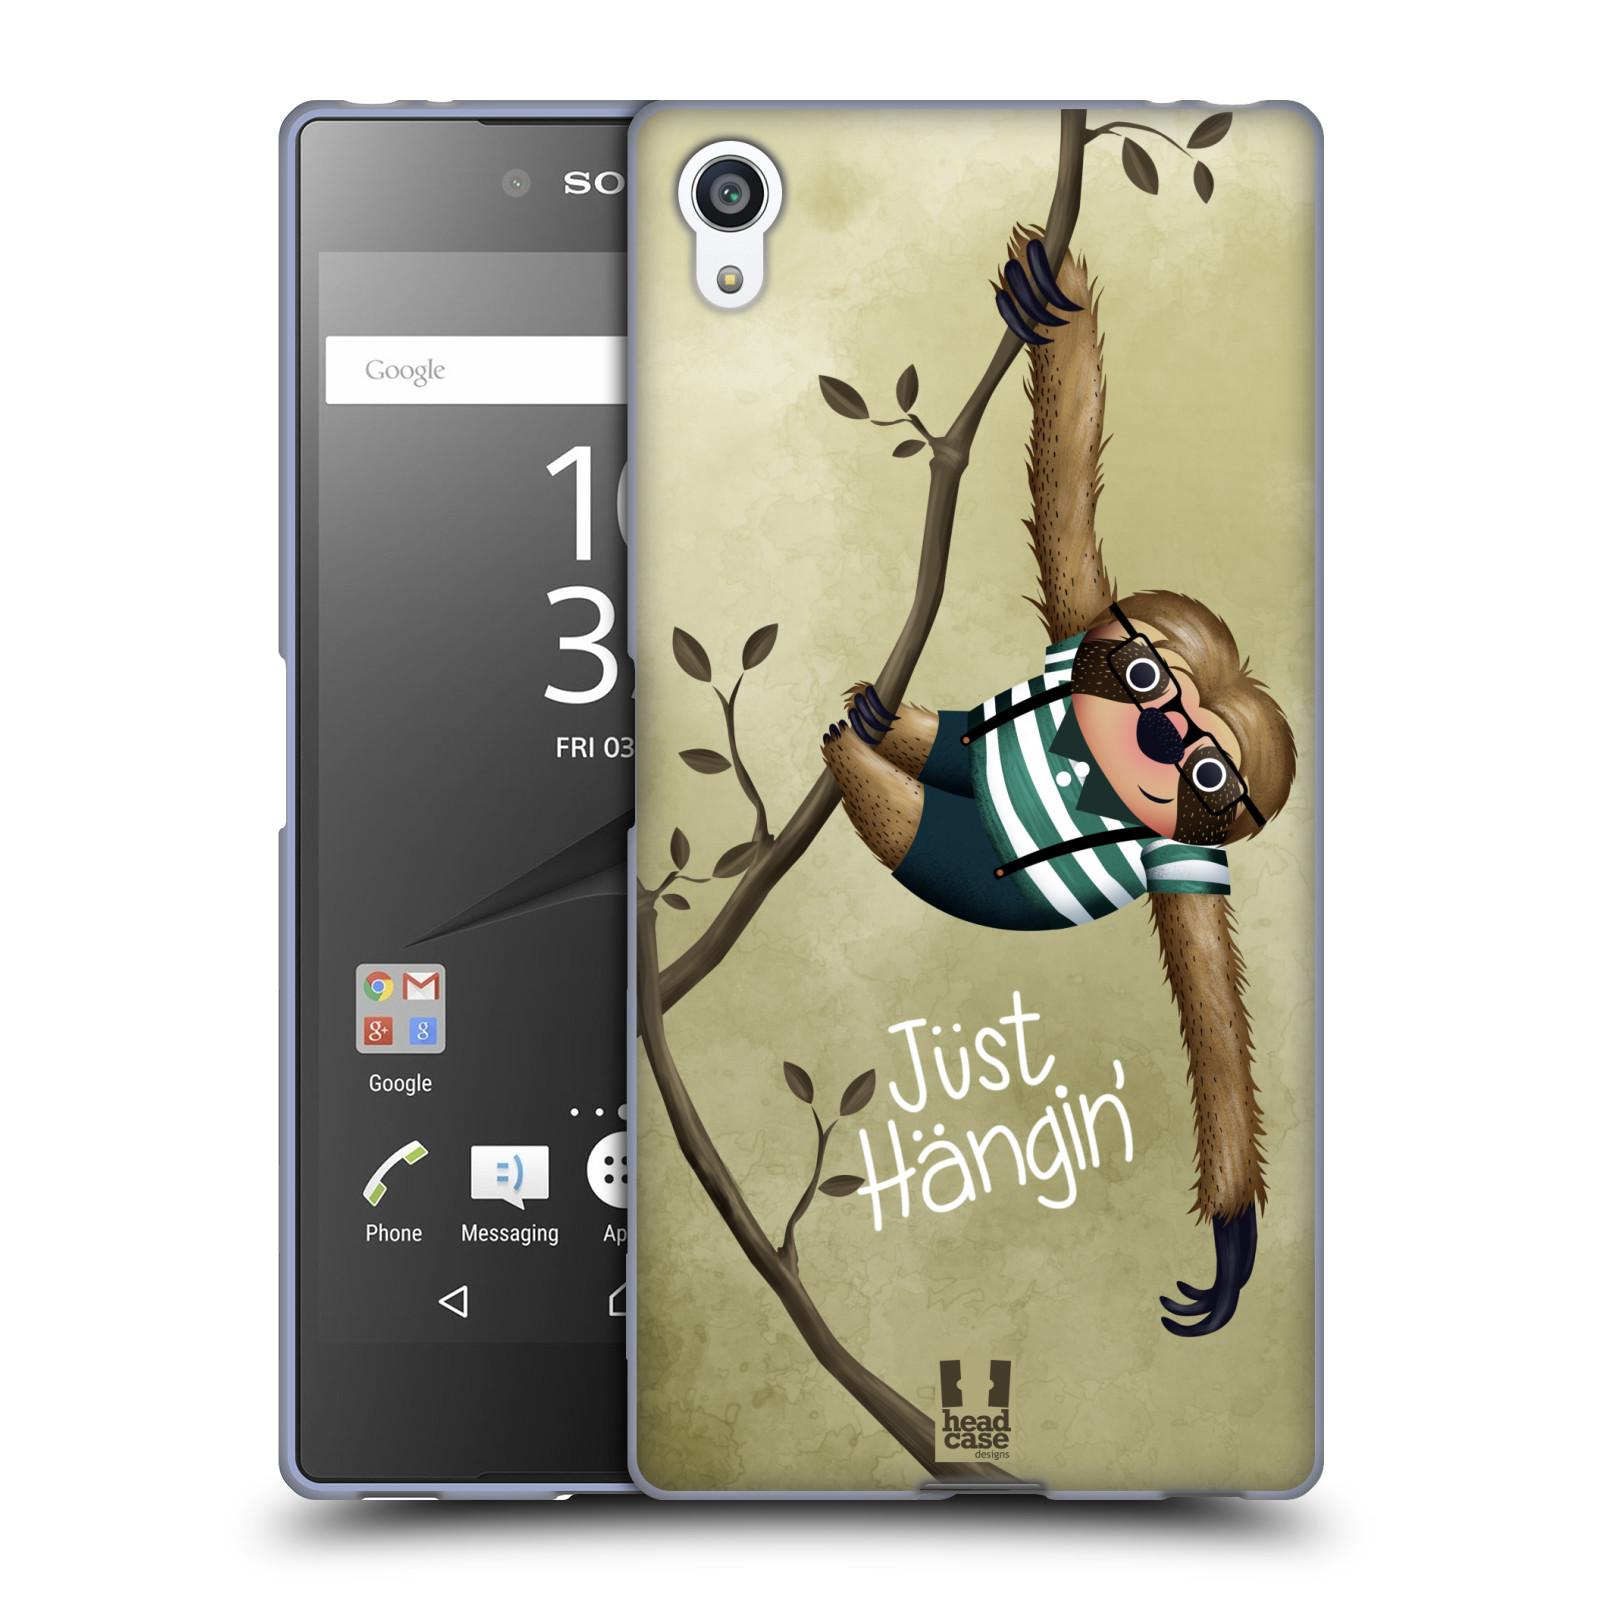 Silikonové pouzdro na mobil Sony Xperia Z5 Premium HEAD CASE Lenochod Just Hangin